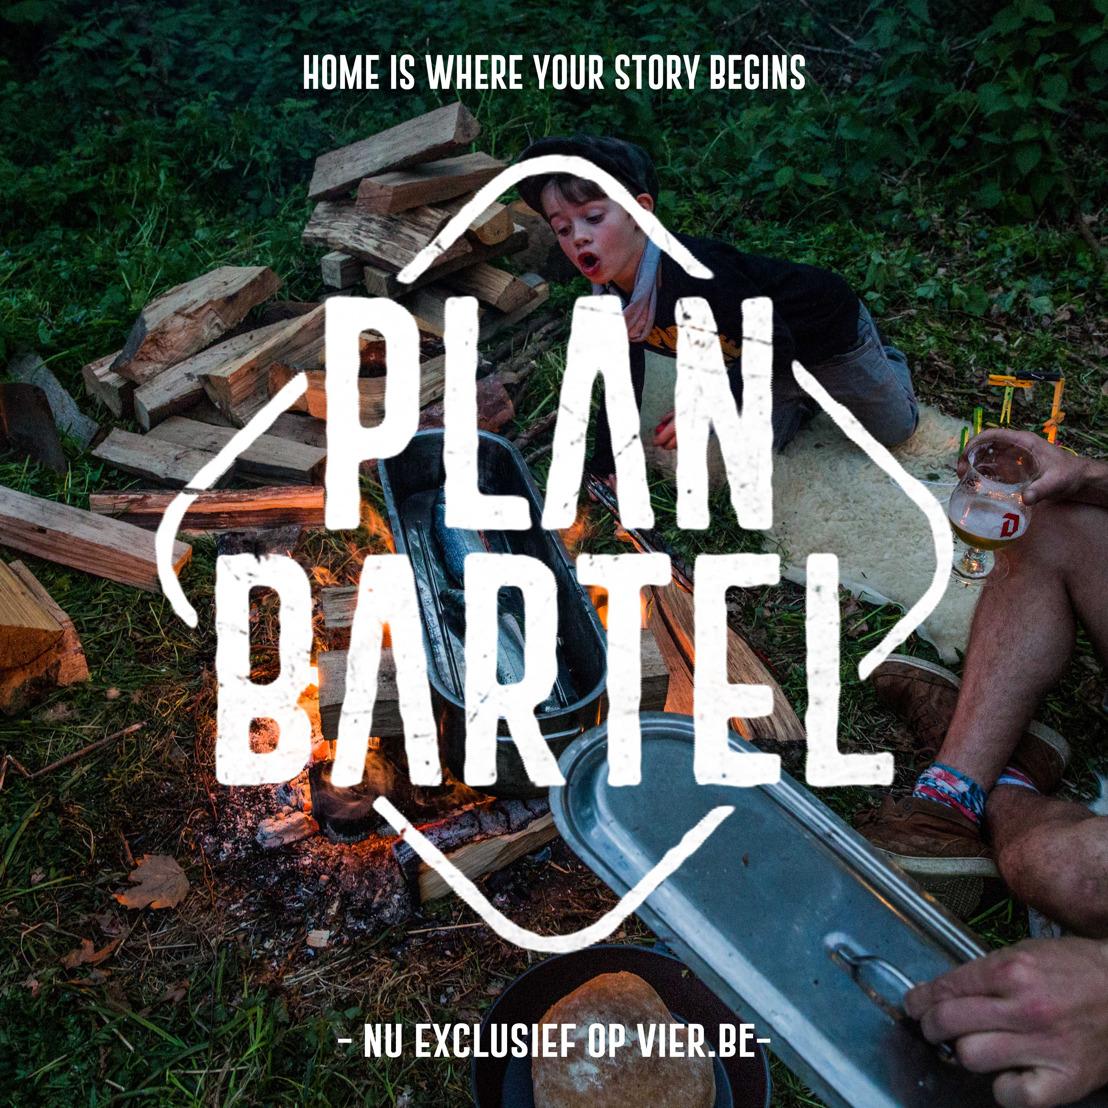 Plan Bartel - Bartel avonturiert vanaf morgen op VIER.be